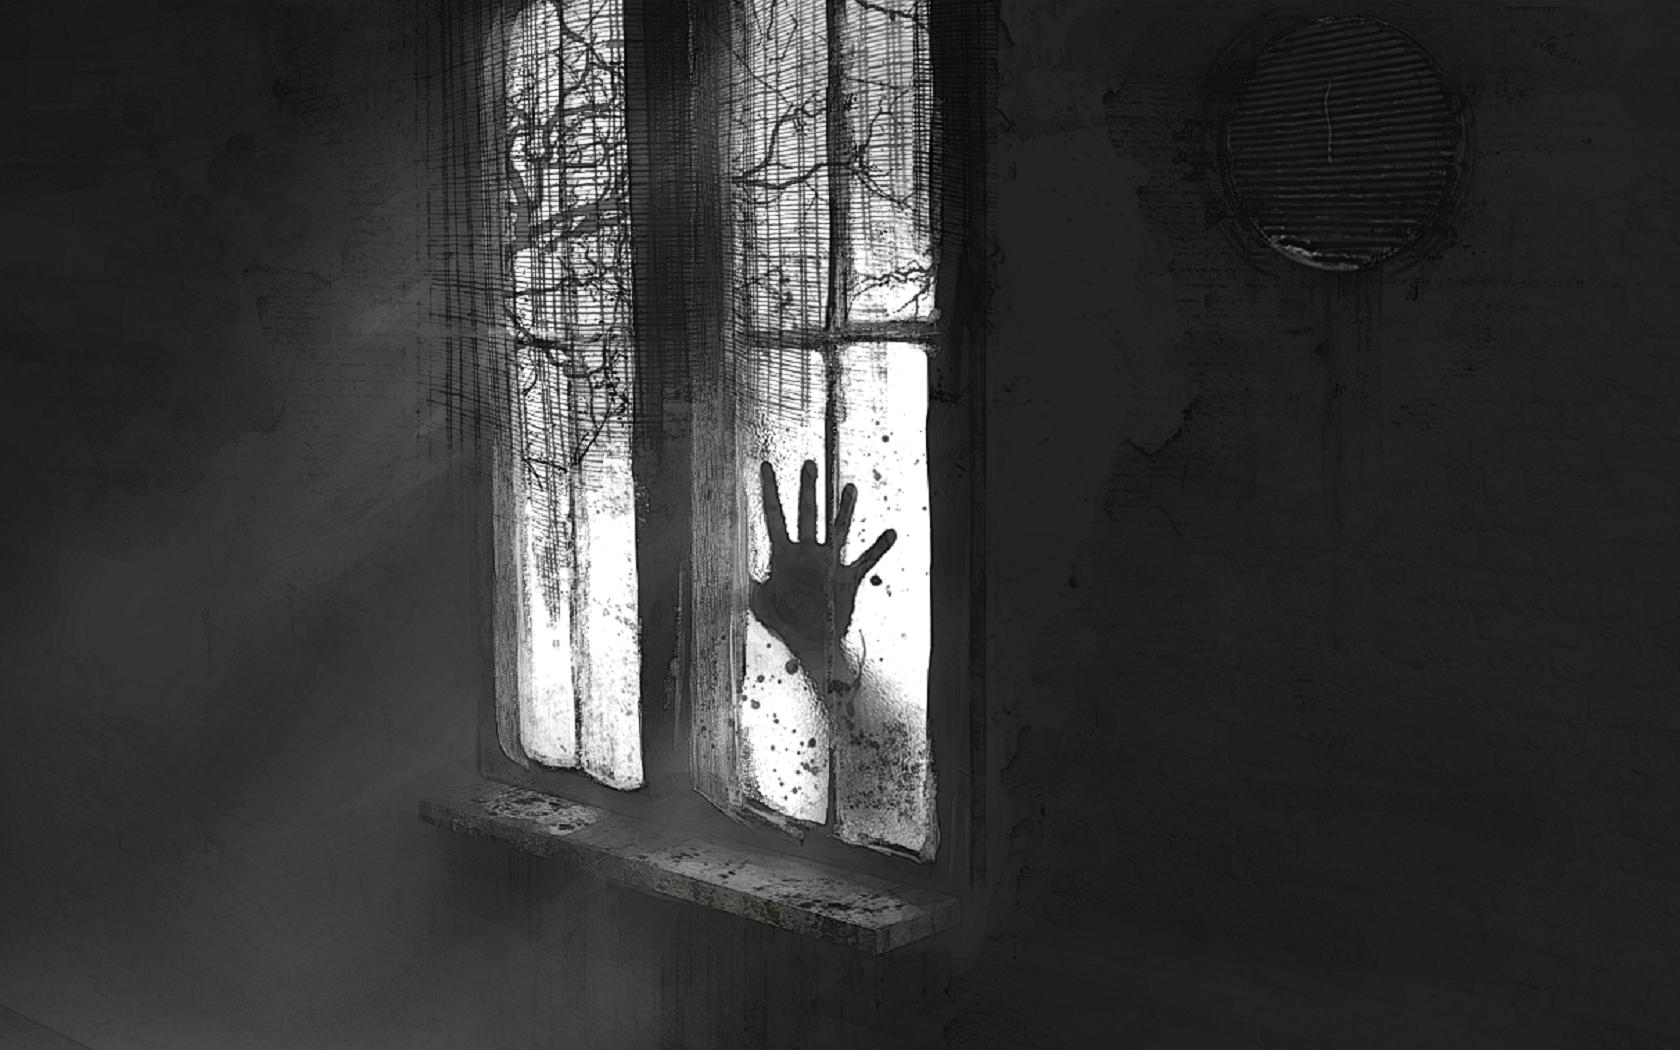 Creepy wallpaper and background image 1680x1050 id - Dark horror creepy wallpapers ...